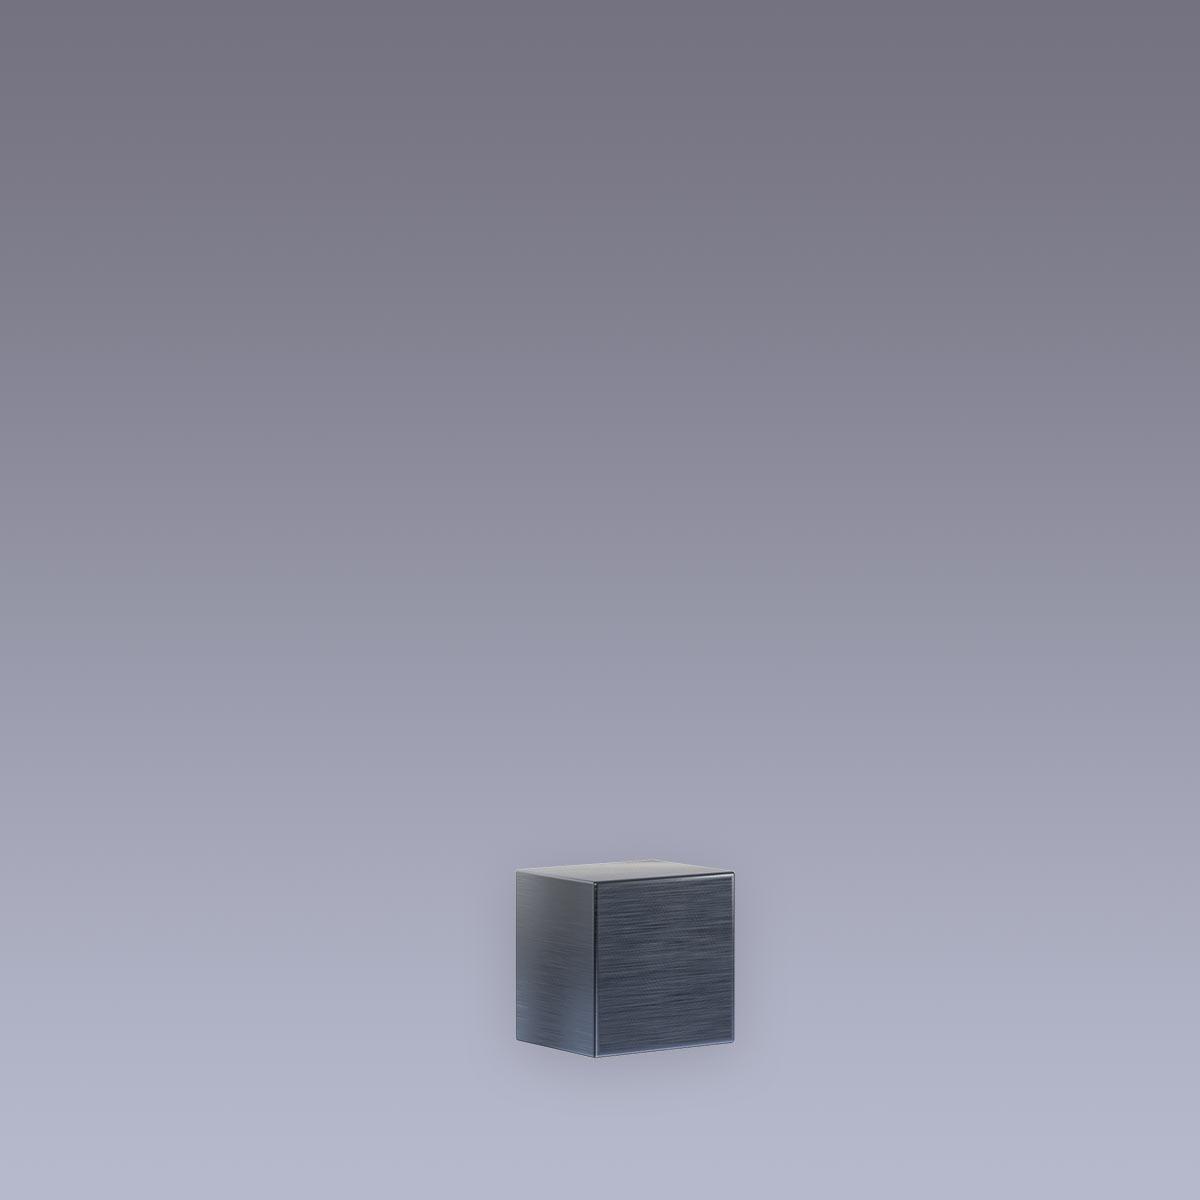 3D Hausnummer . Punkt Edelstahl anthrazit RAL7016 in 3D Design Arial